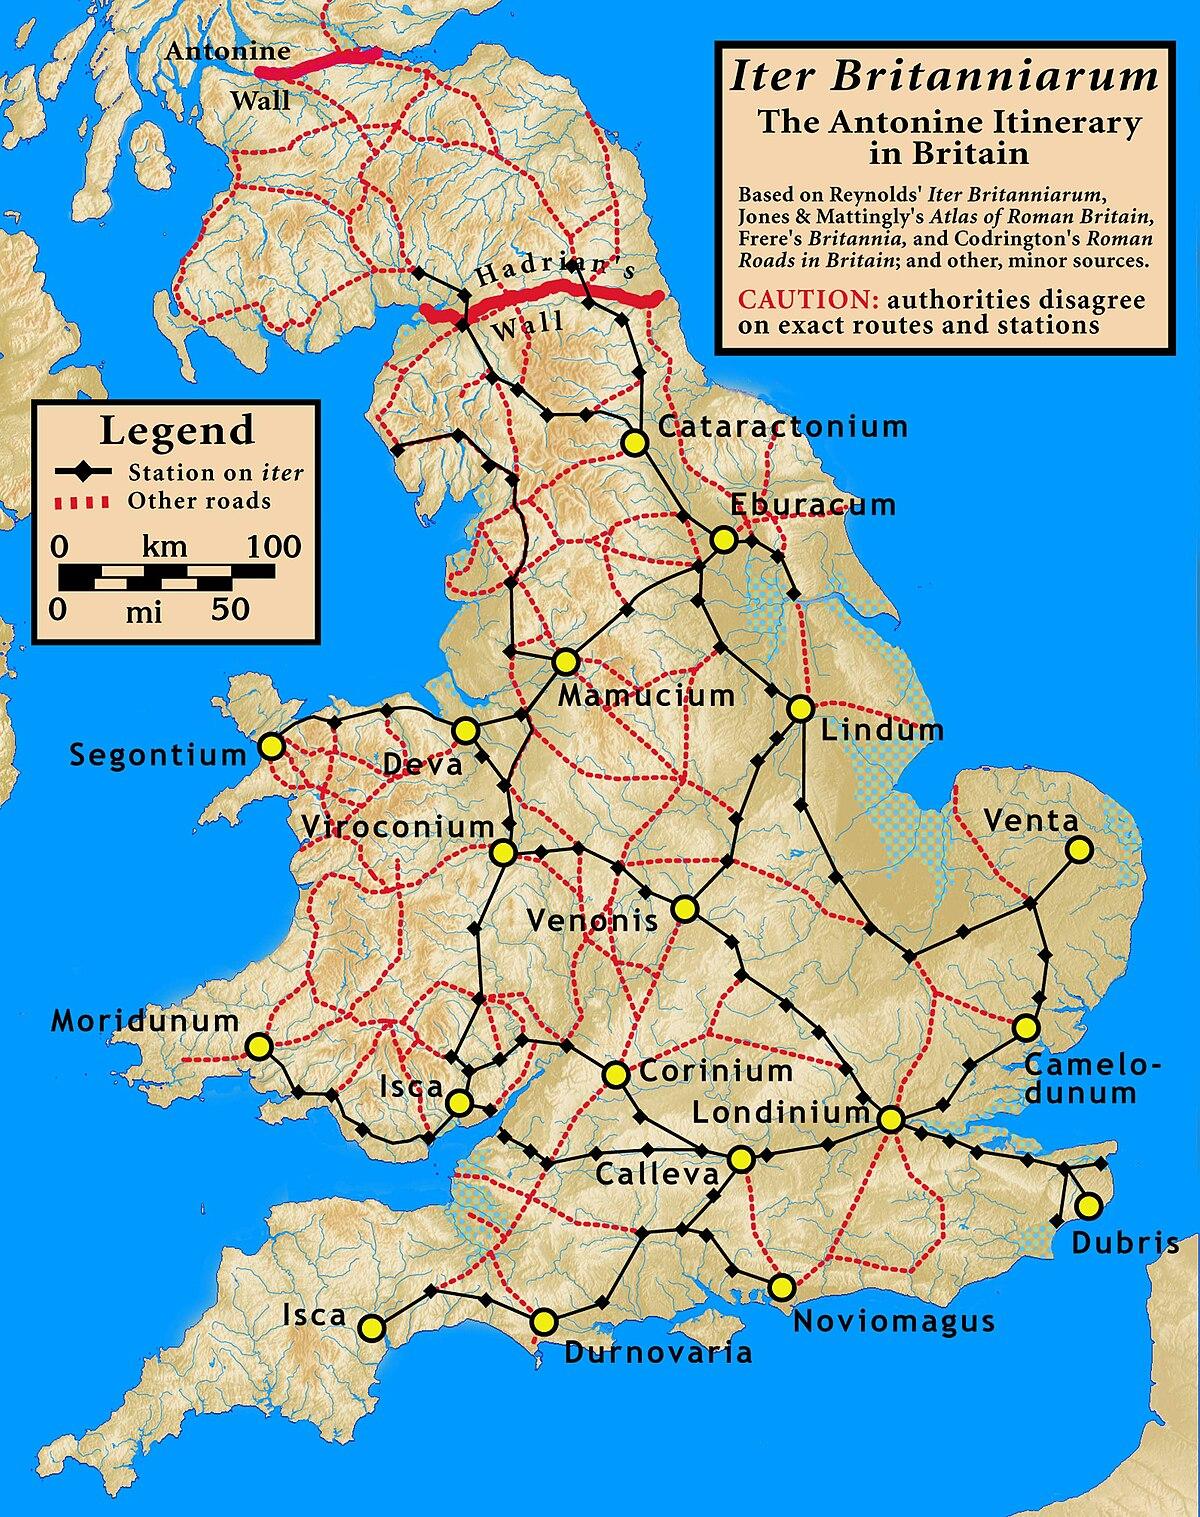 https://upload.wikimedia.org/wikipedia/commons/thumb/9/9e/Iter.Britanniarum.jpg/1200px-Iter.Britanniarum.jpg